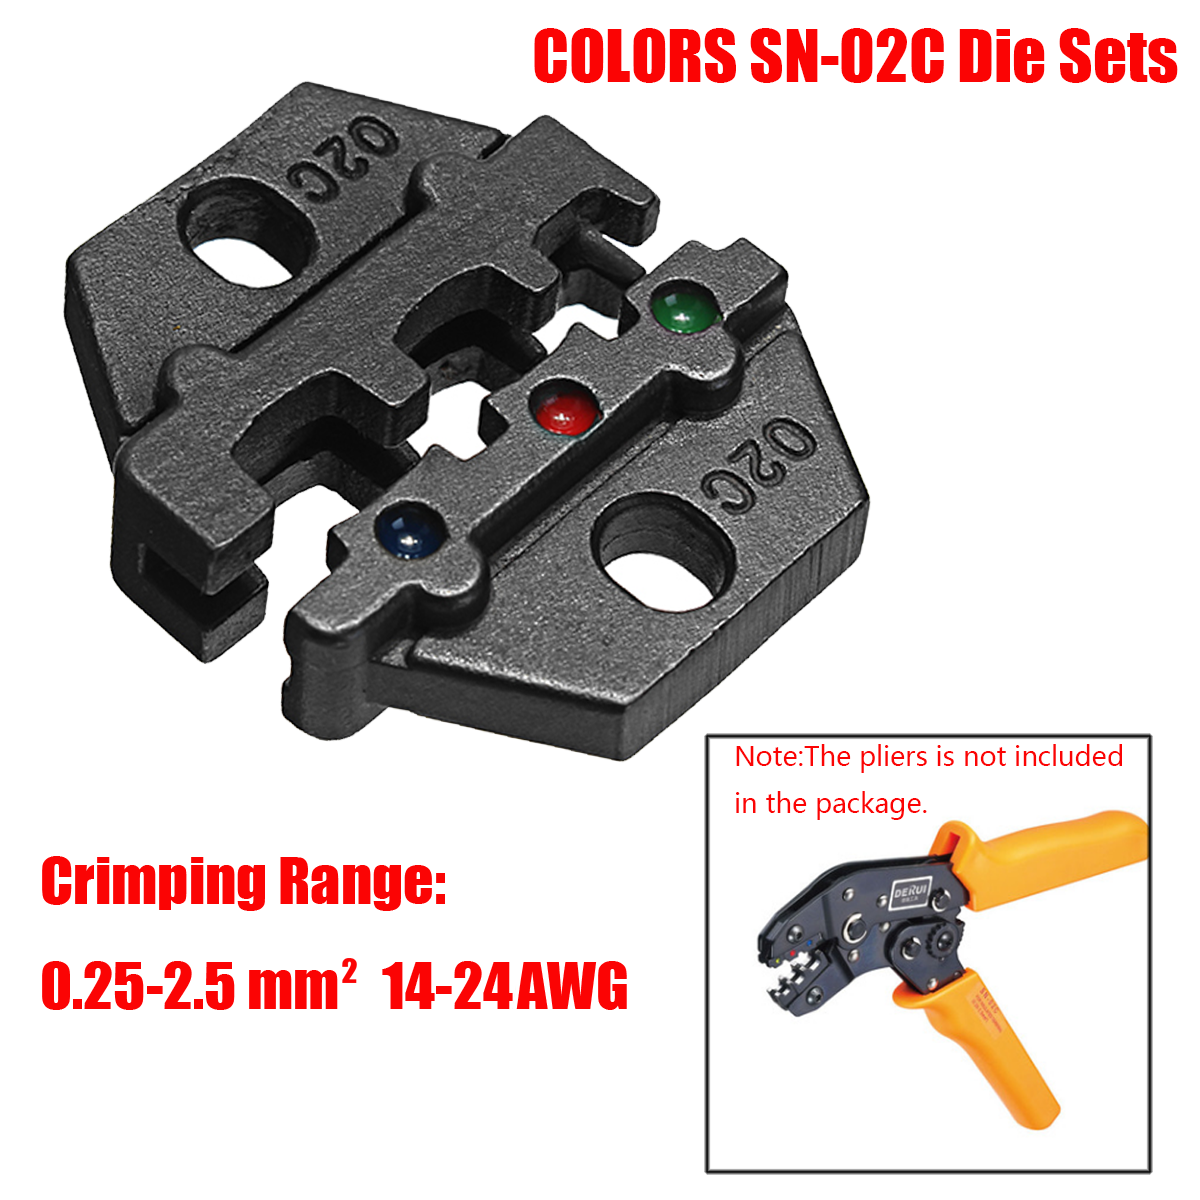 SN-02C Steel Die Sets for SN Crimping Plier Series 0.25-2.5mm2 14-24AWG  new 1